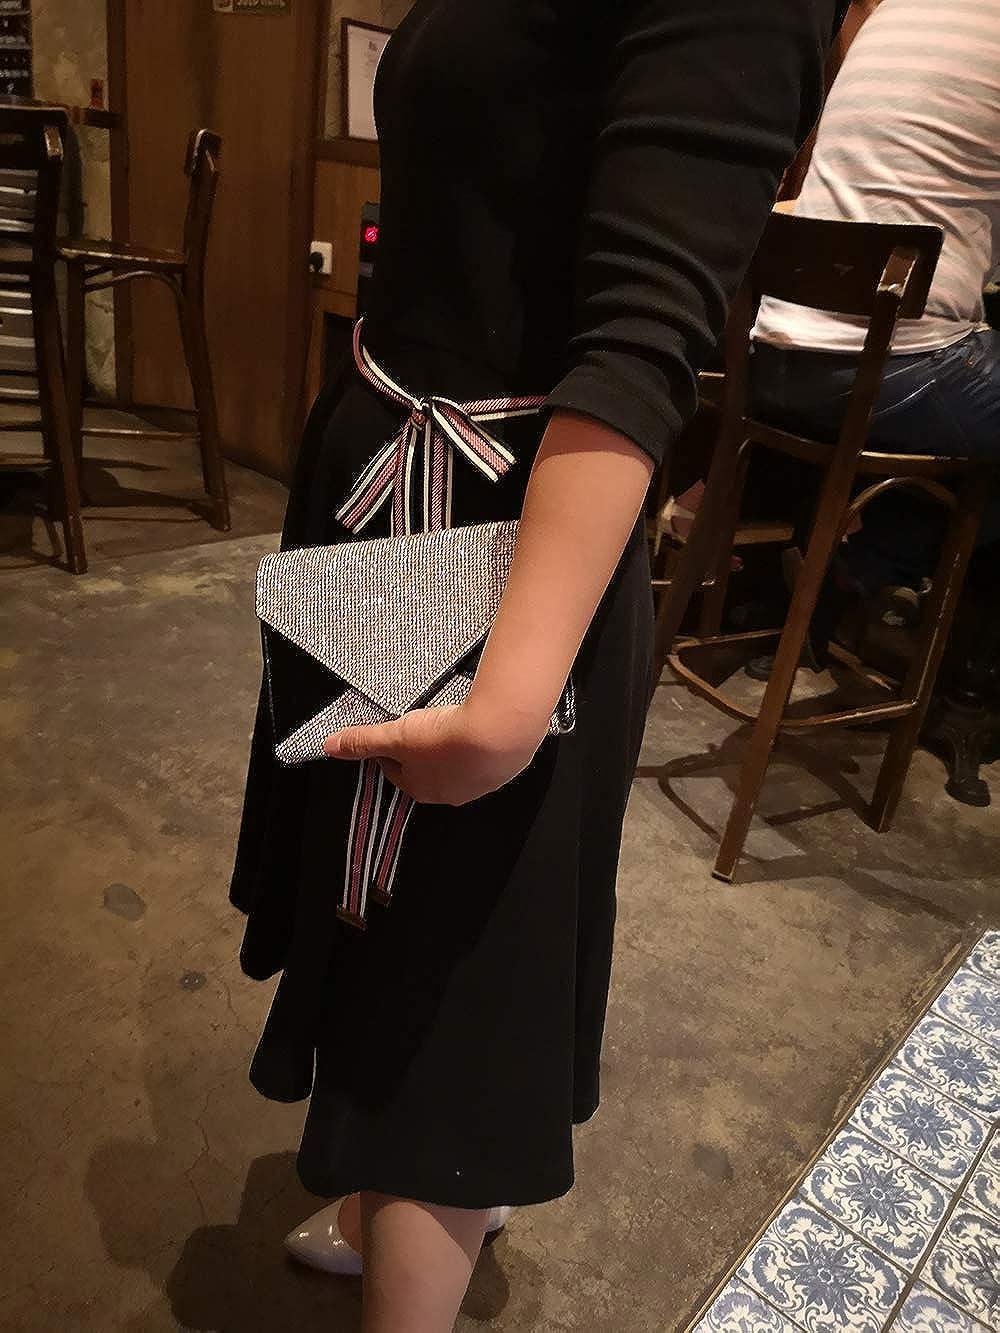 iwish Womens Glitter Full Rhinestone Envelope Clutch Purse Bag for Party Prom Wedding Evening Handbag